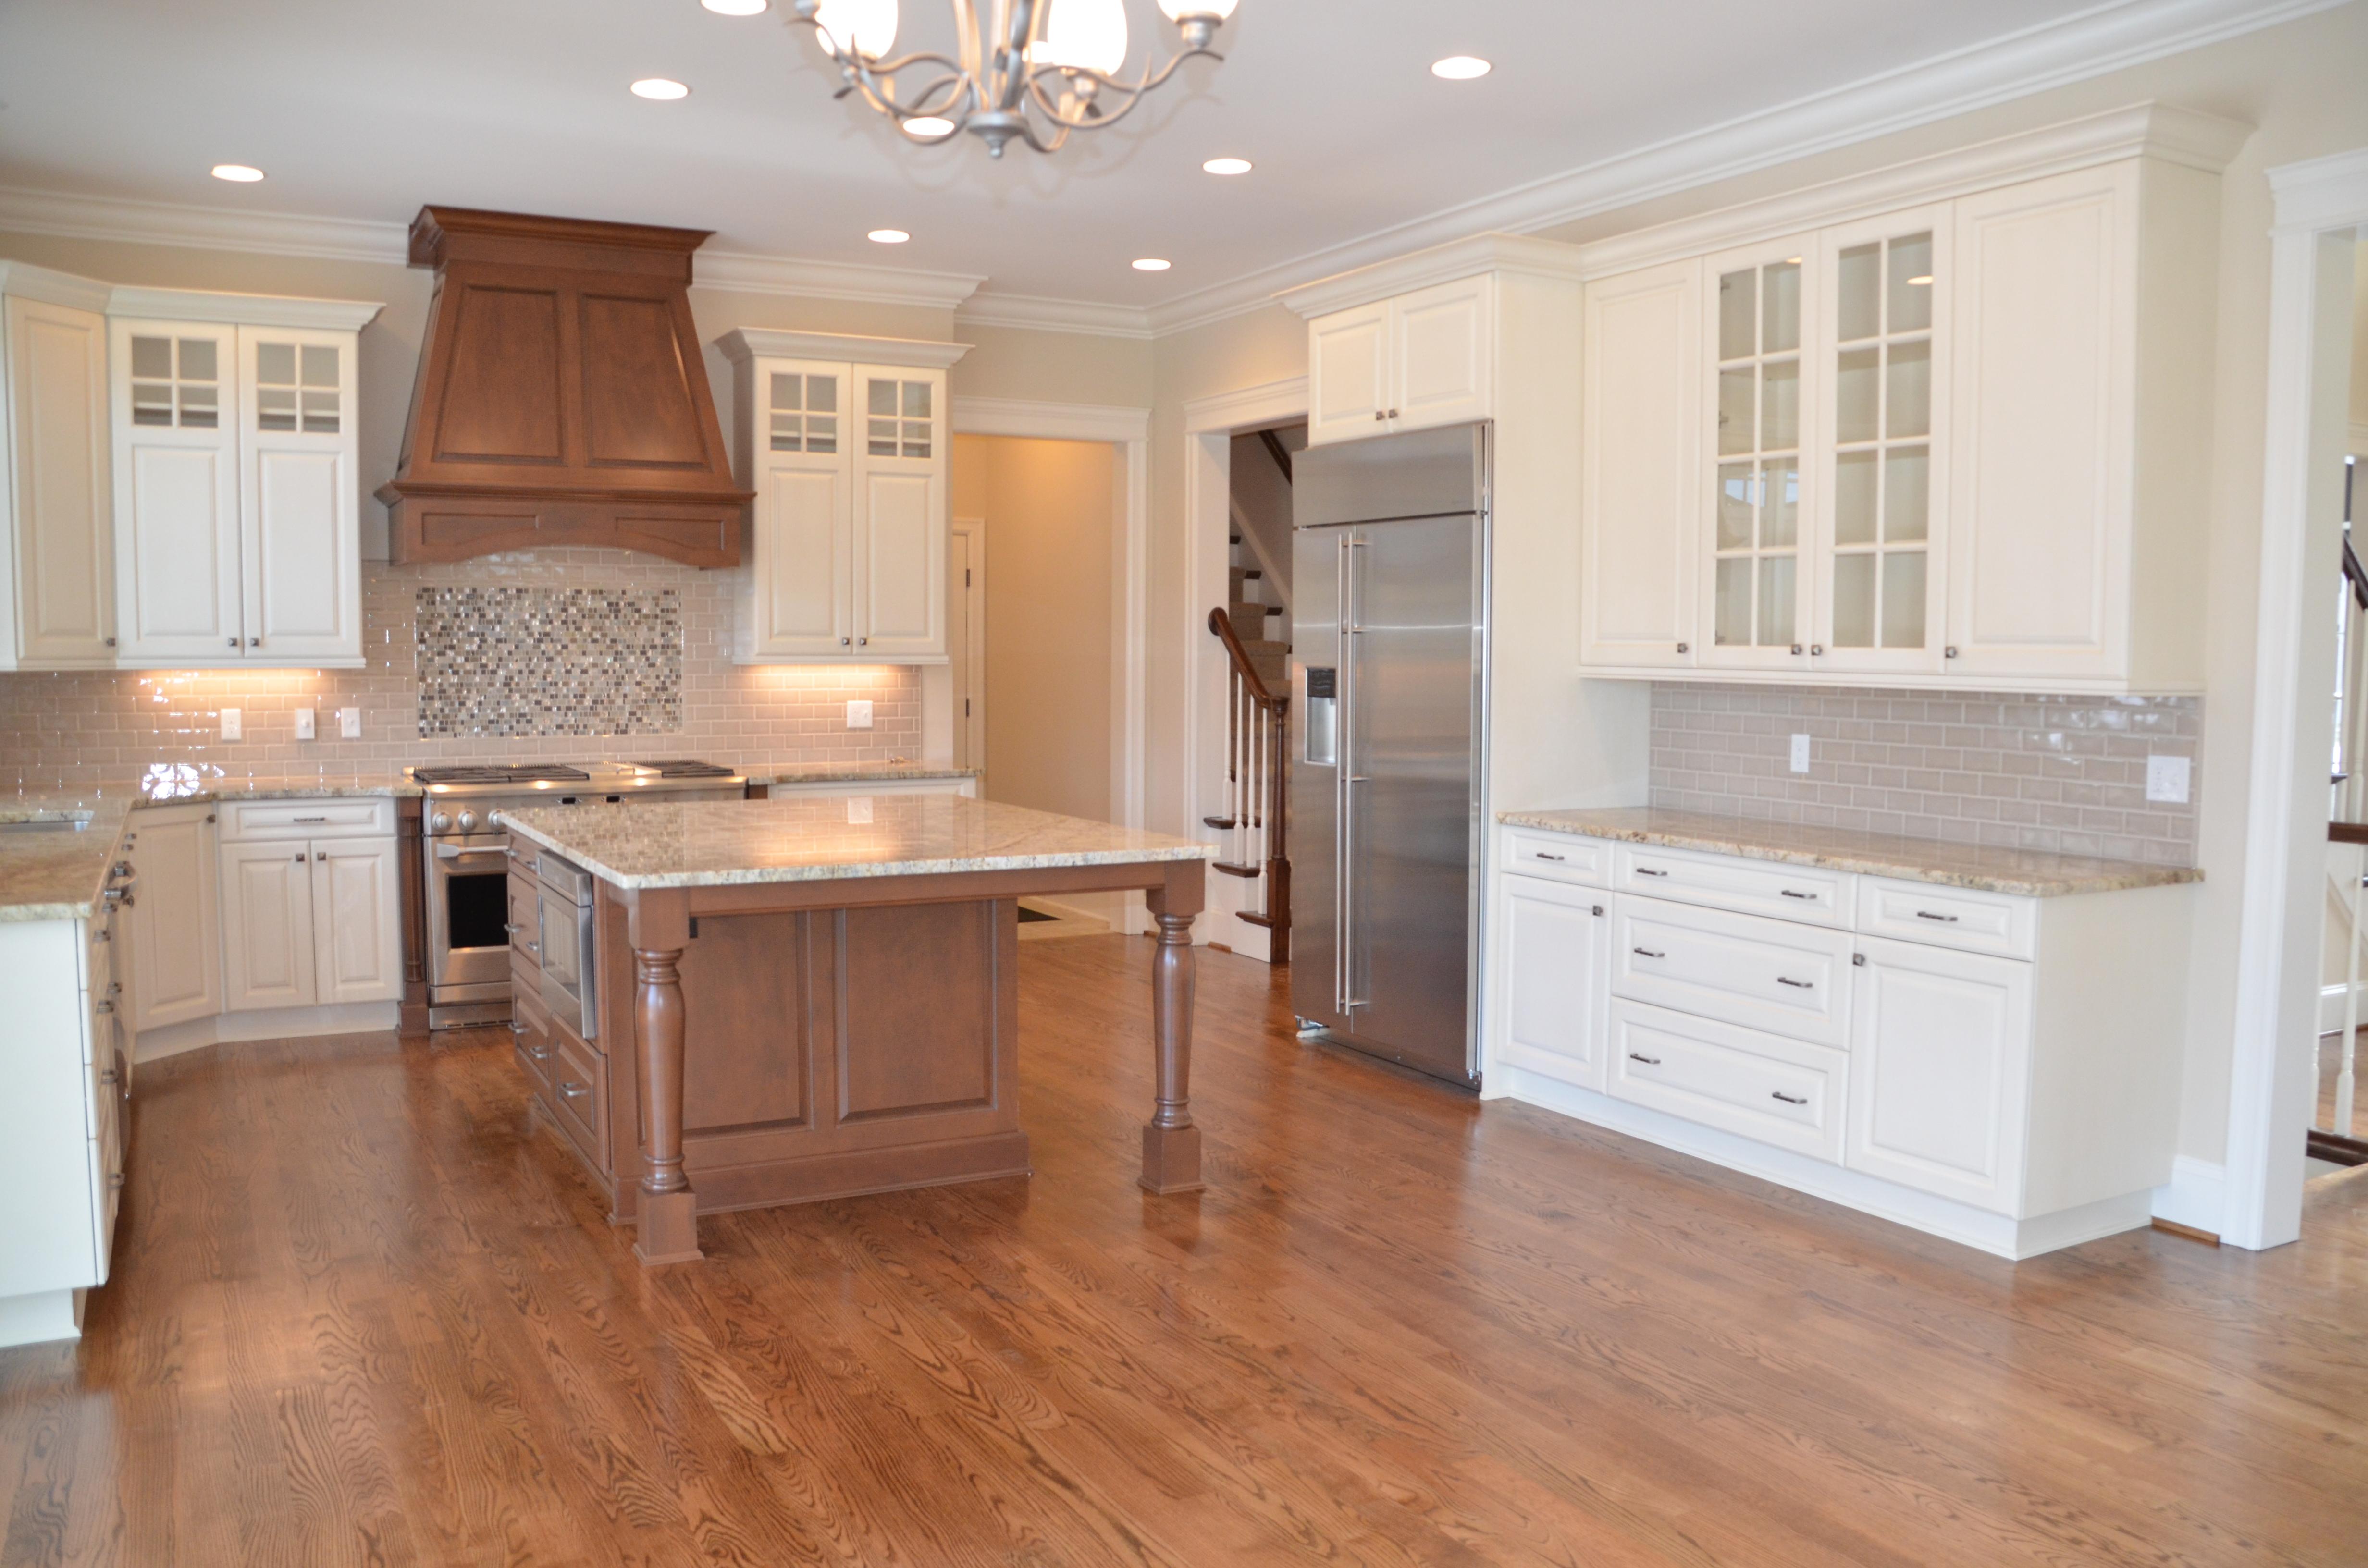 Pittsford NY Homes - Kitchen